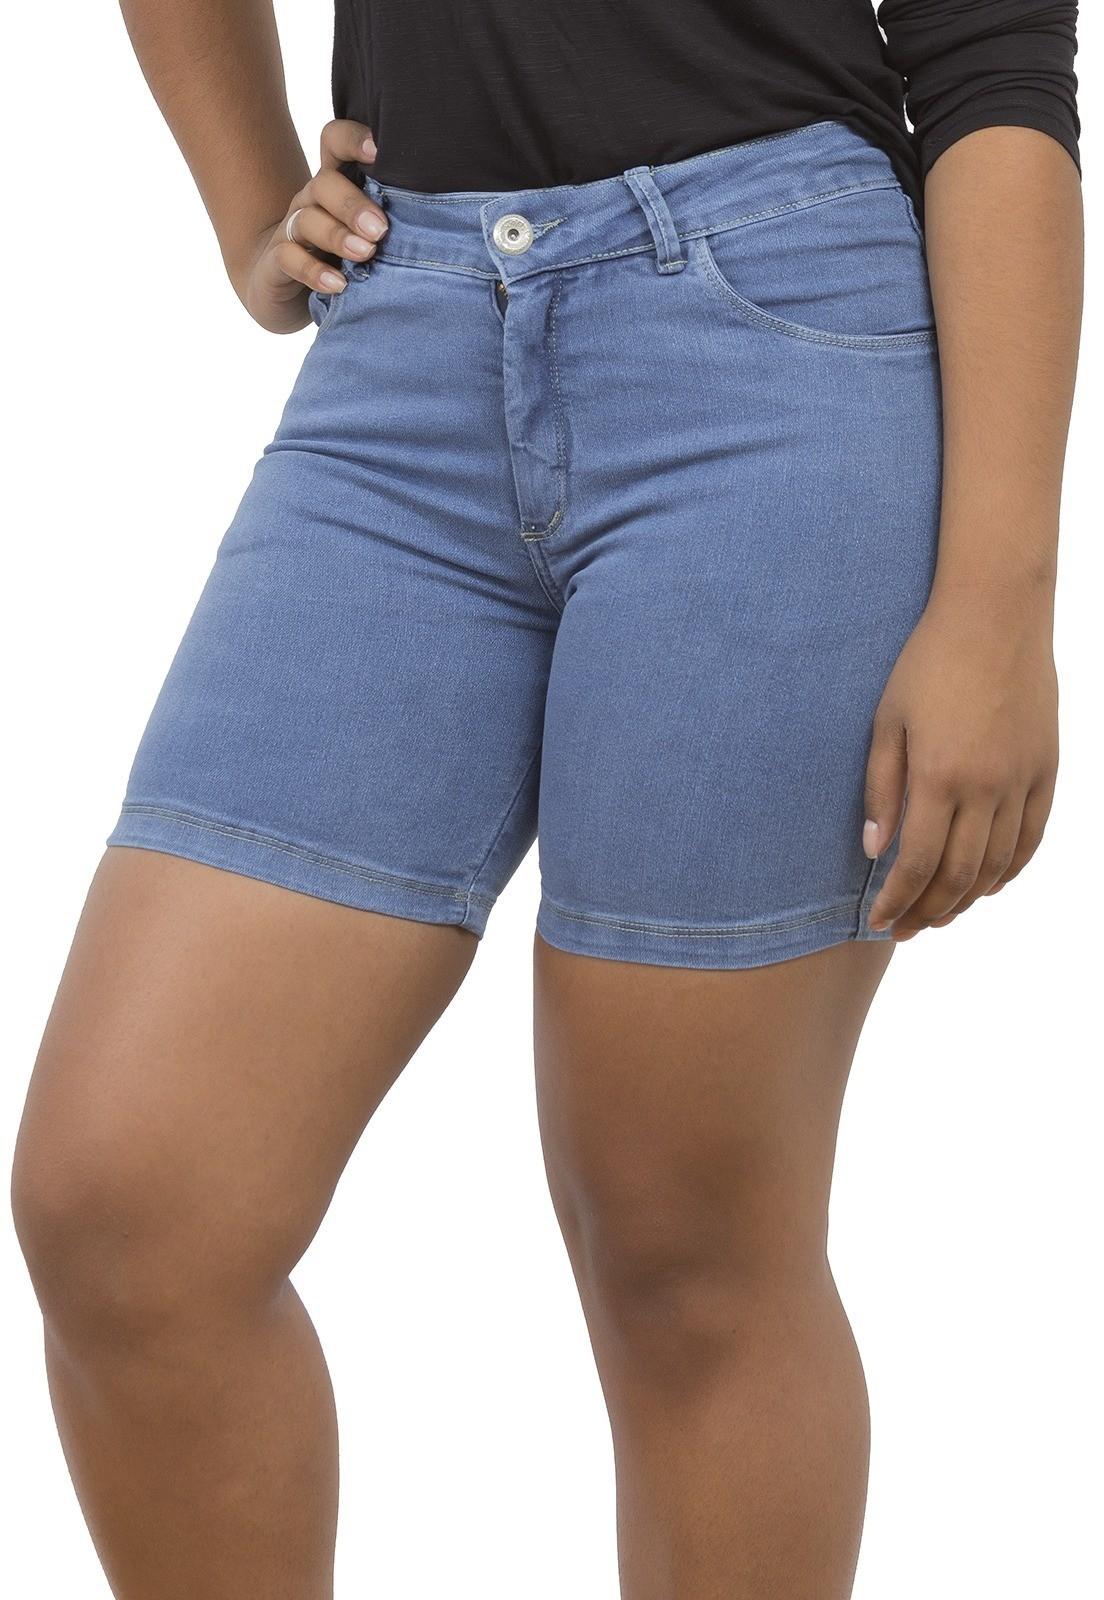 Shorts Dinho's Jeans Basico Delave [1876]